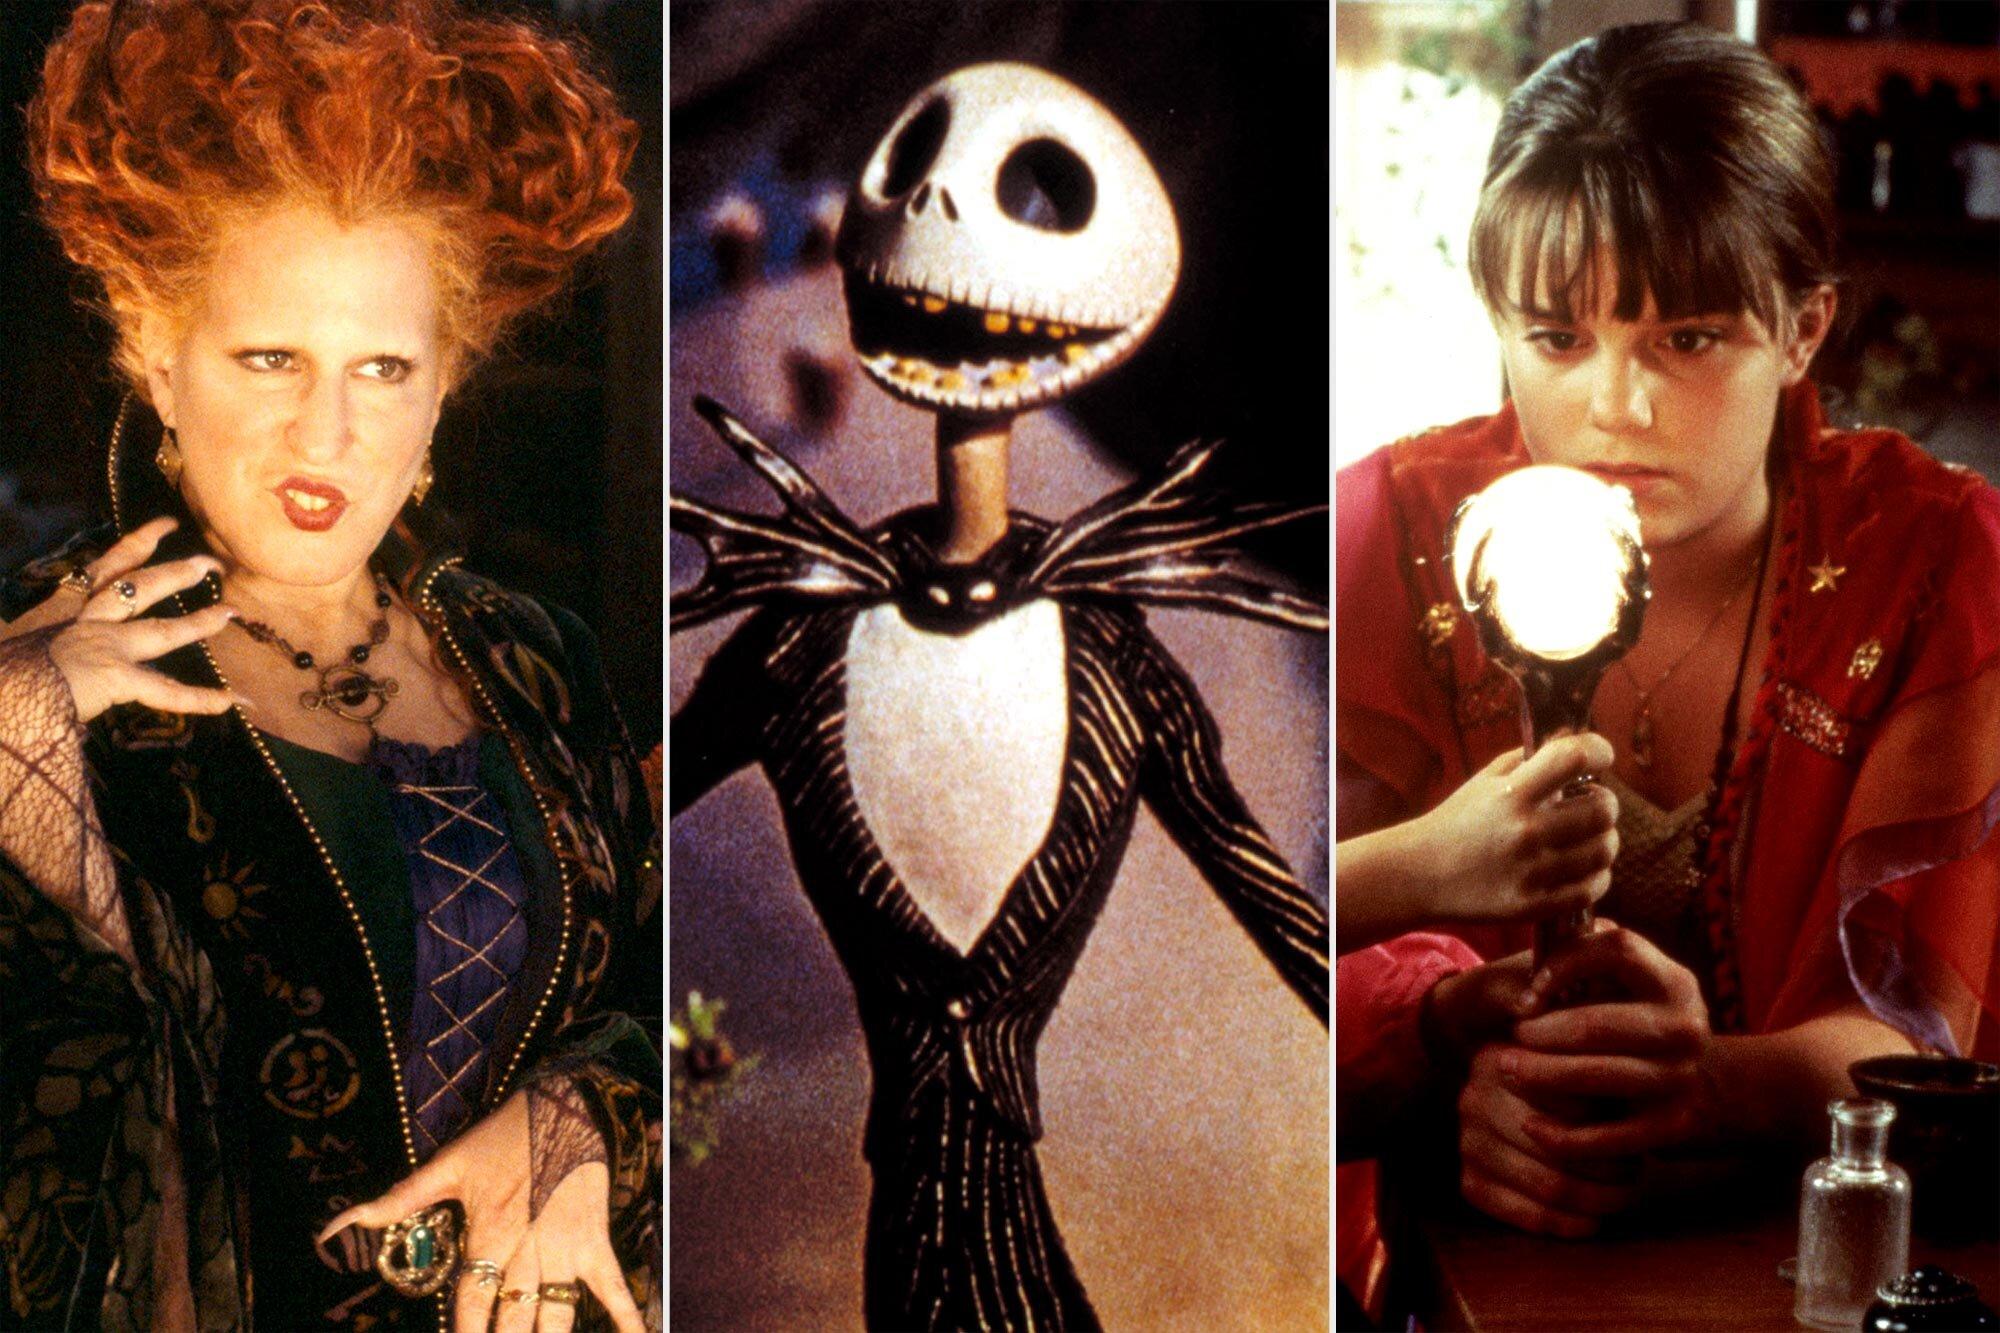 Family Friendly Halloween Films For Boos Big And Small Ew Com